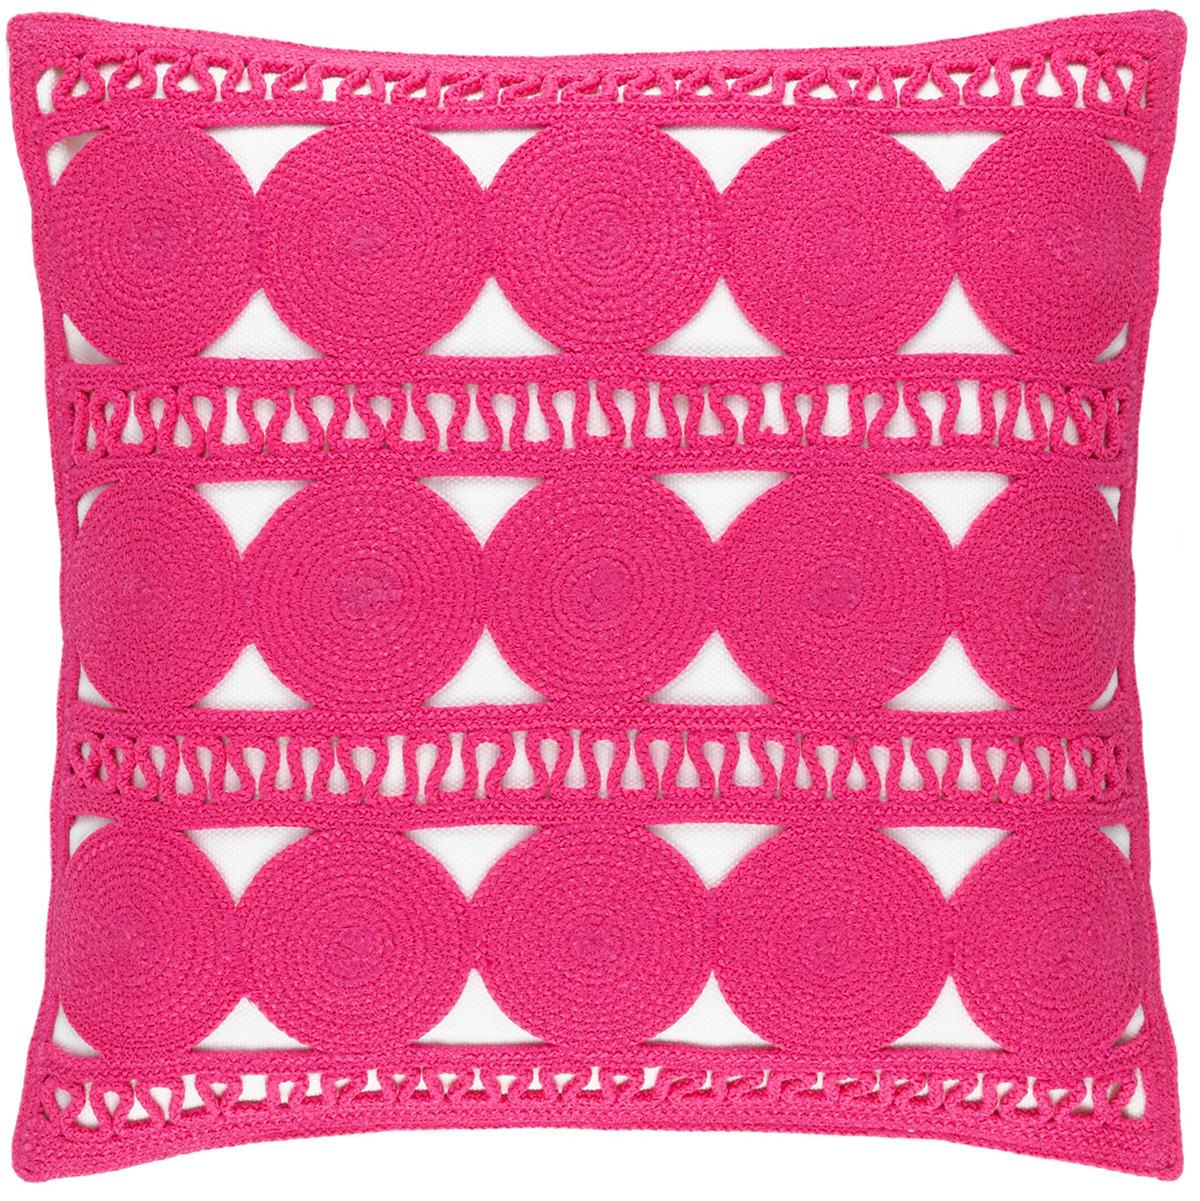 Round Turn Fuchsia Indoor/Outdoor Decorative Pillow